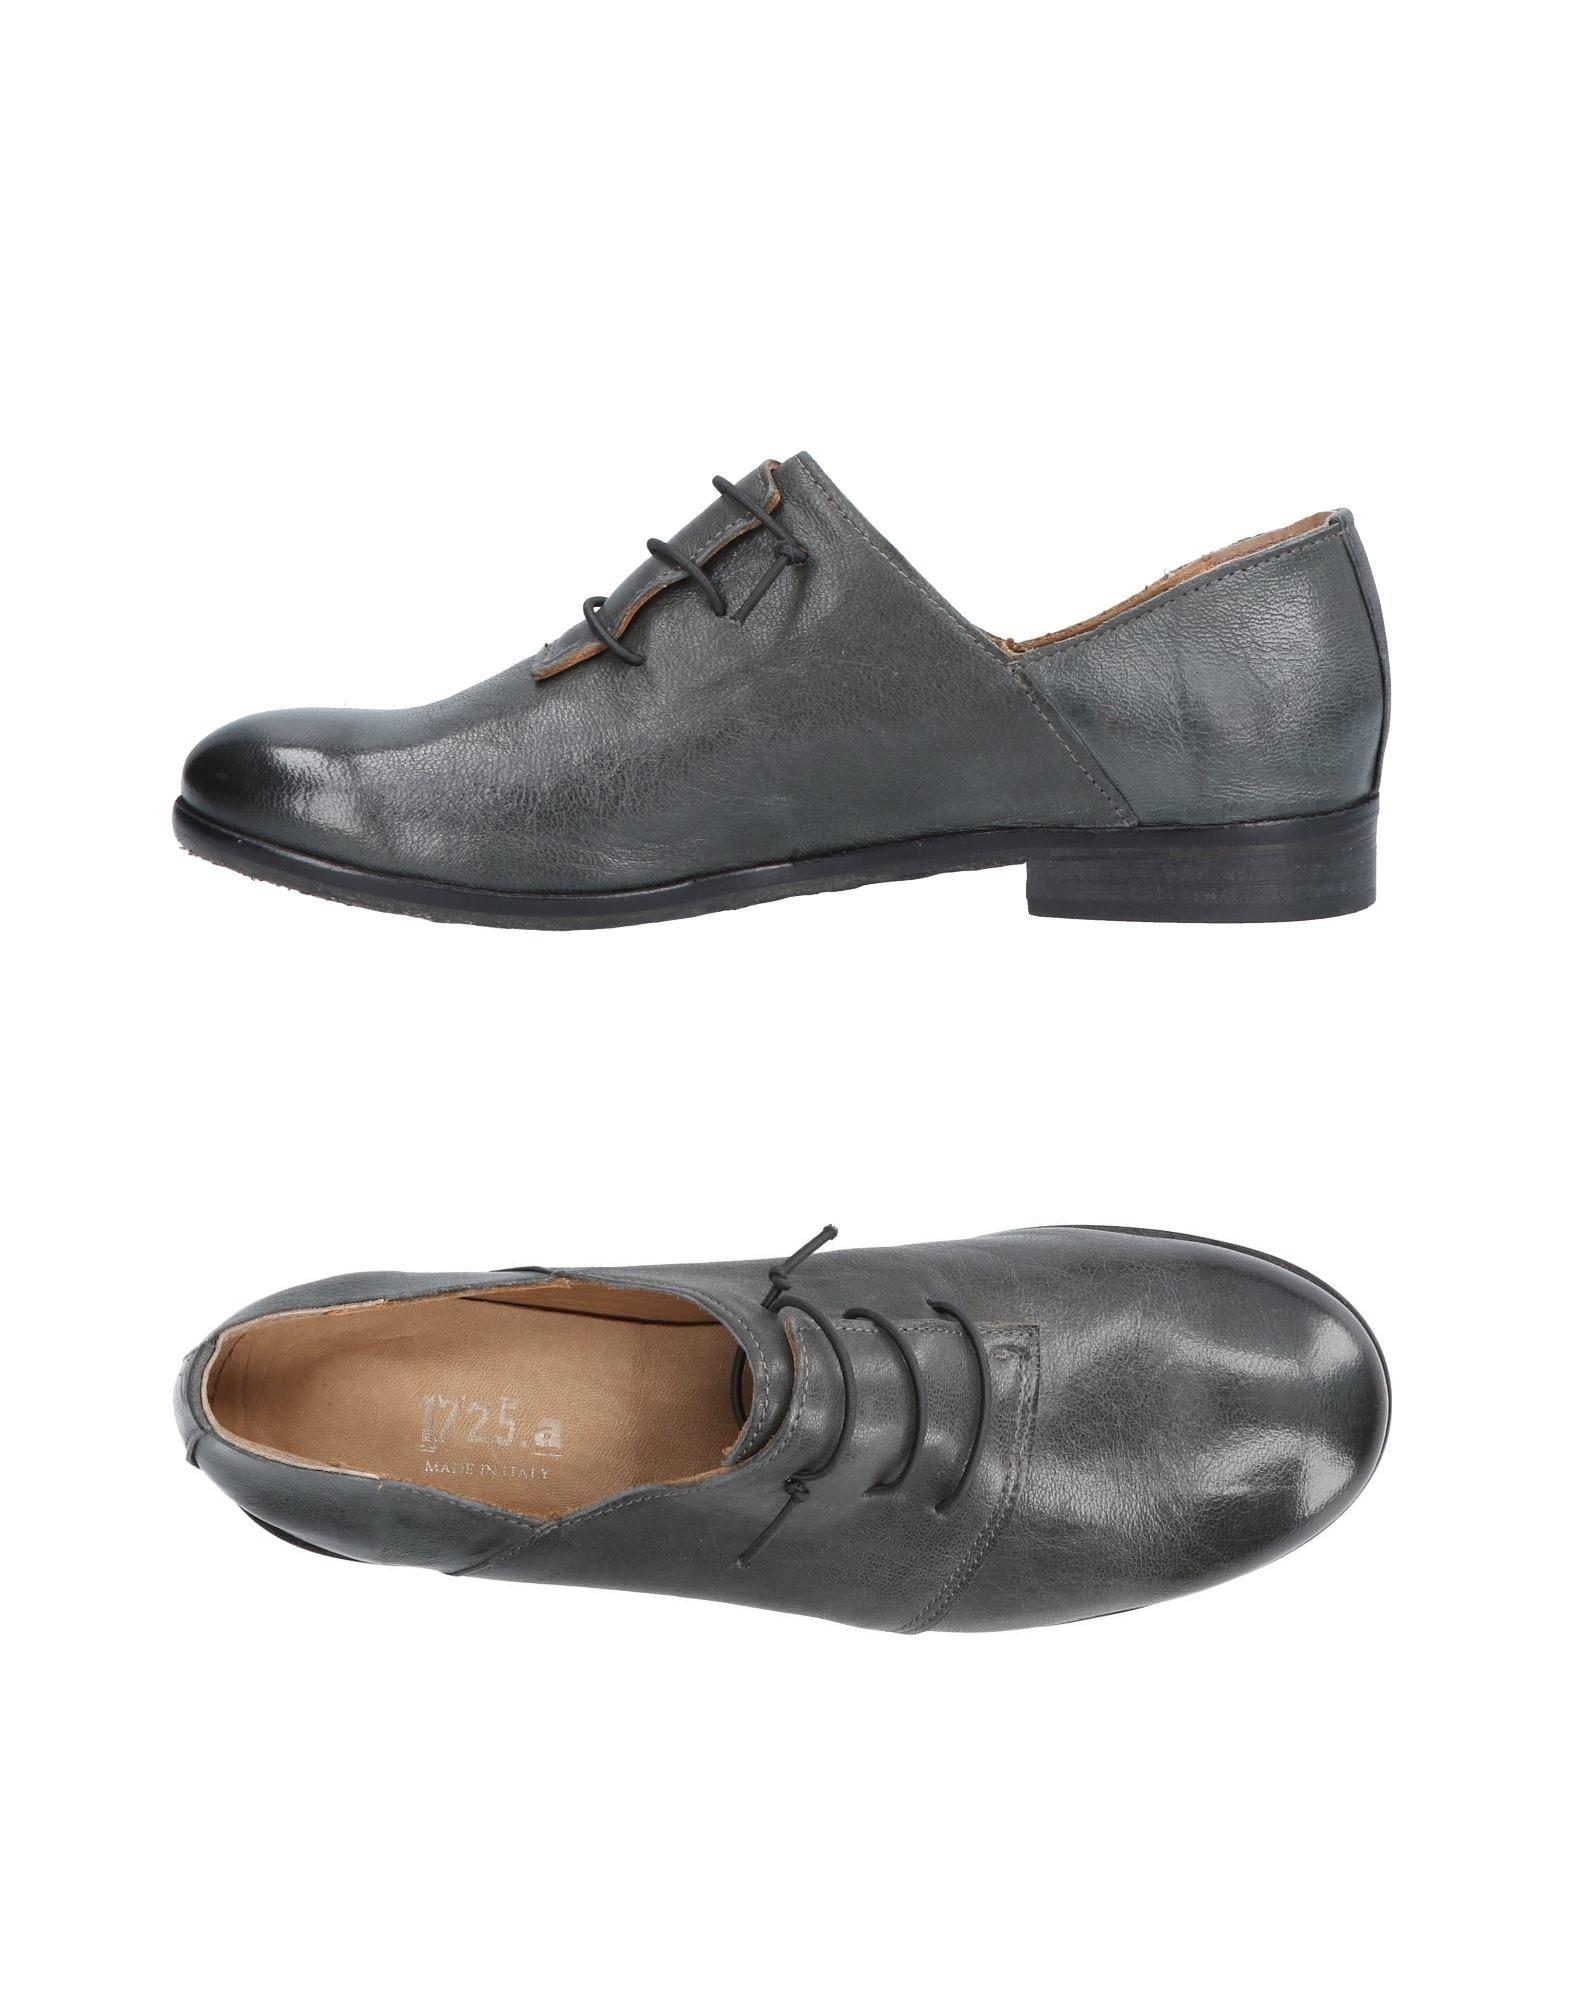 1725.A Обувь на шнурках